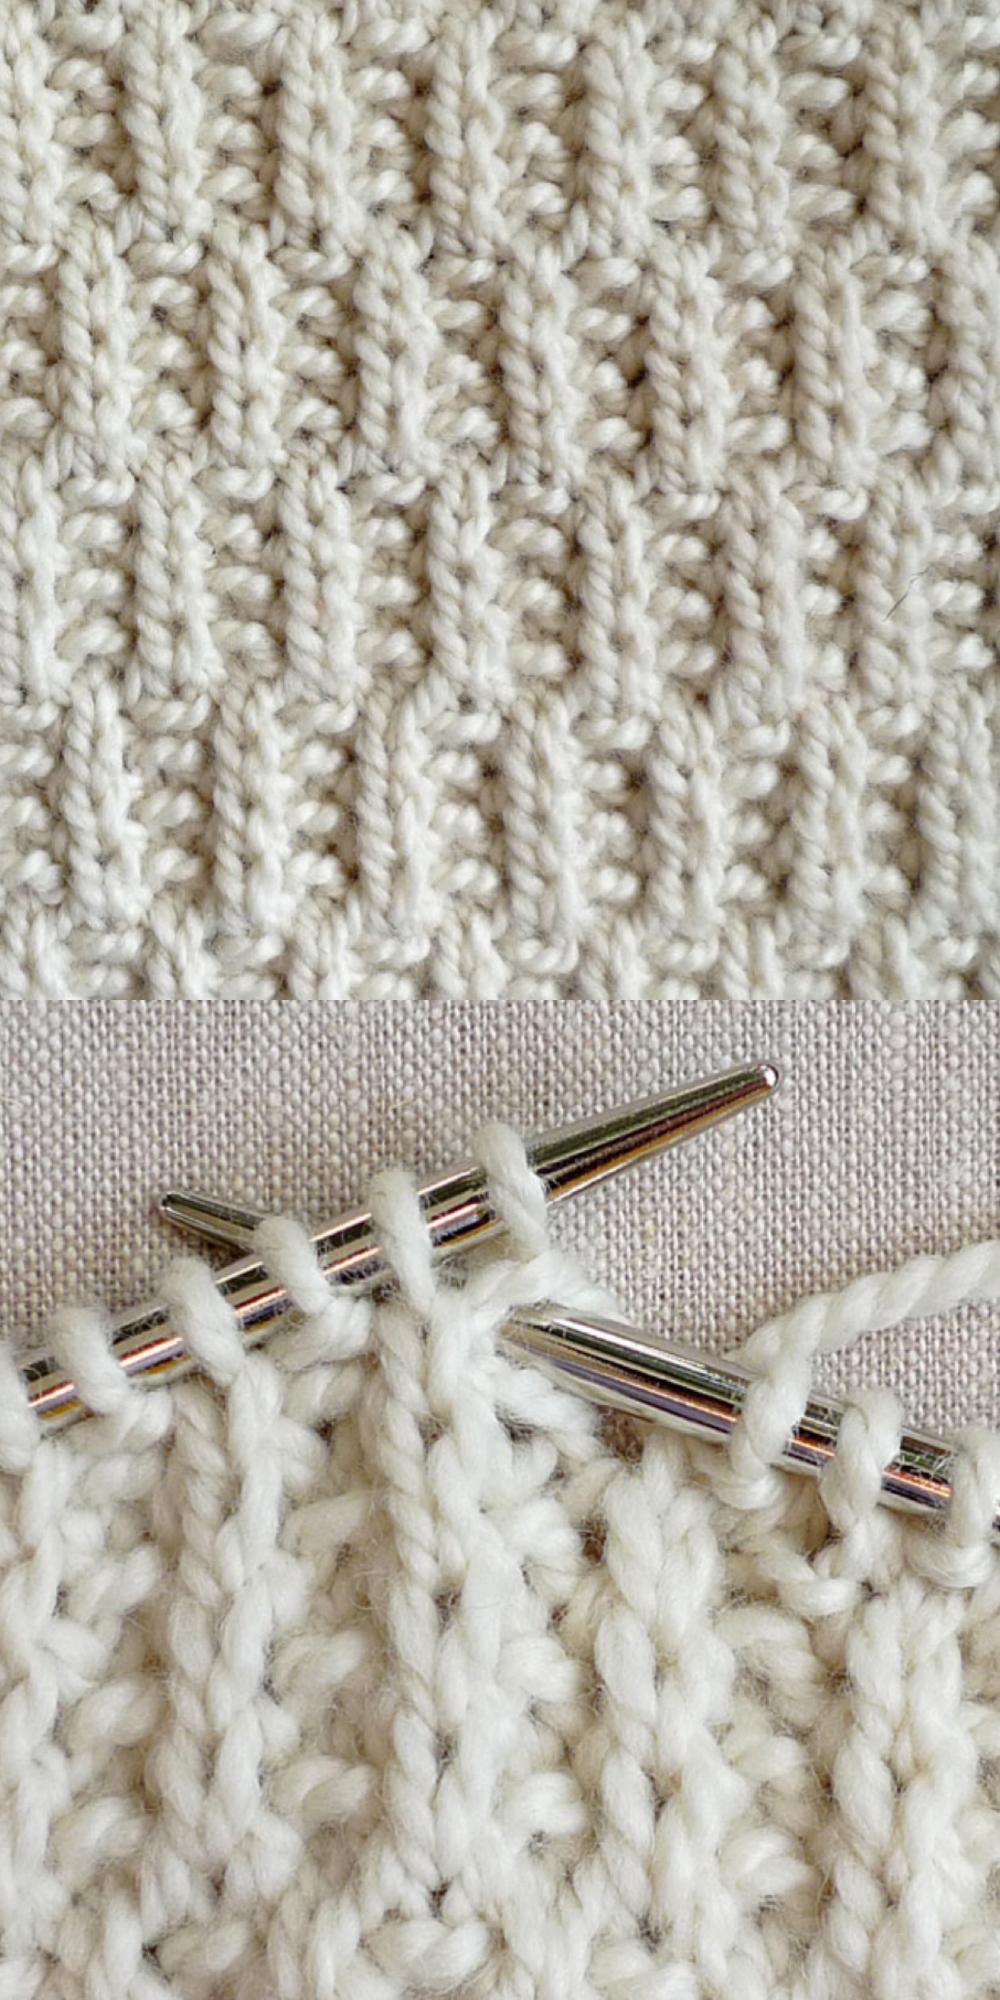 Knittingtutorial Rambler Stitch Has Such Great Texture Its A